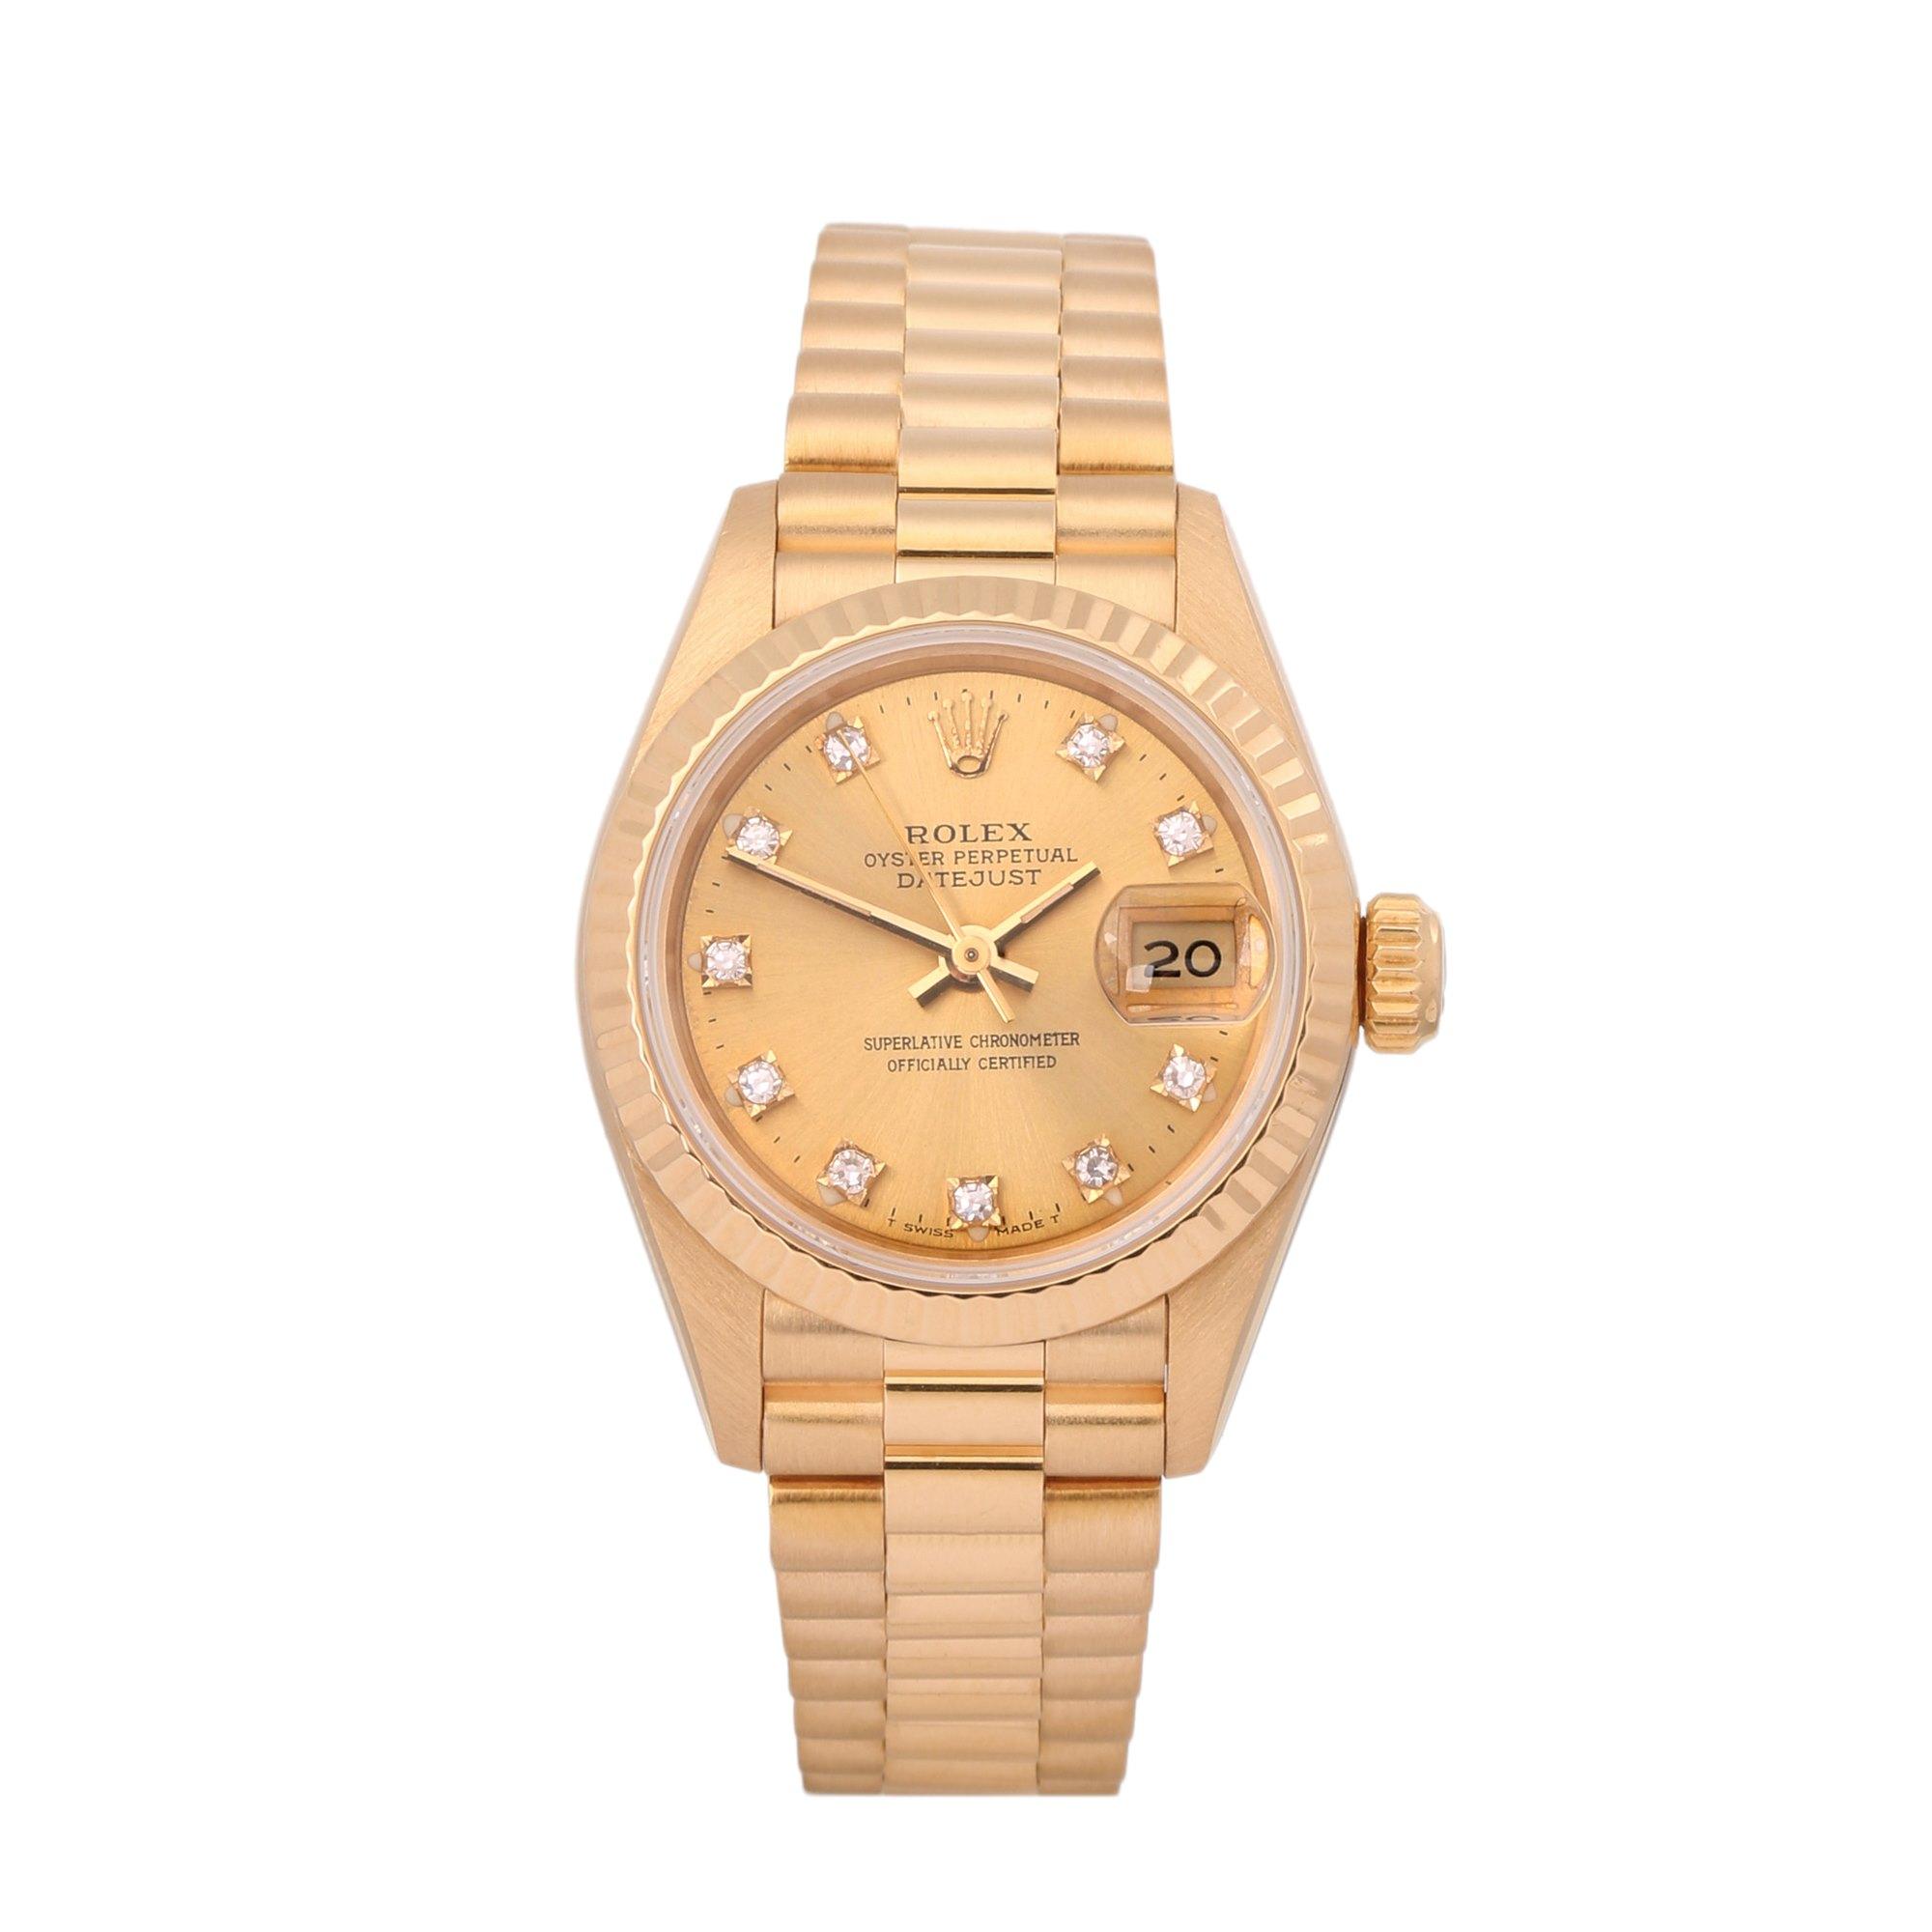 Rolex Datejust 26 18K Yellow Gold 69178G